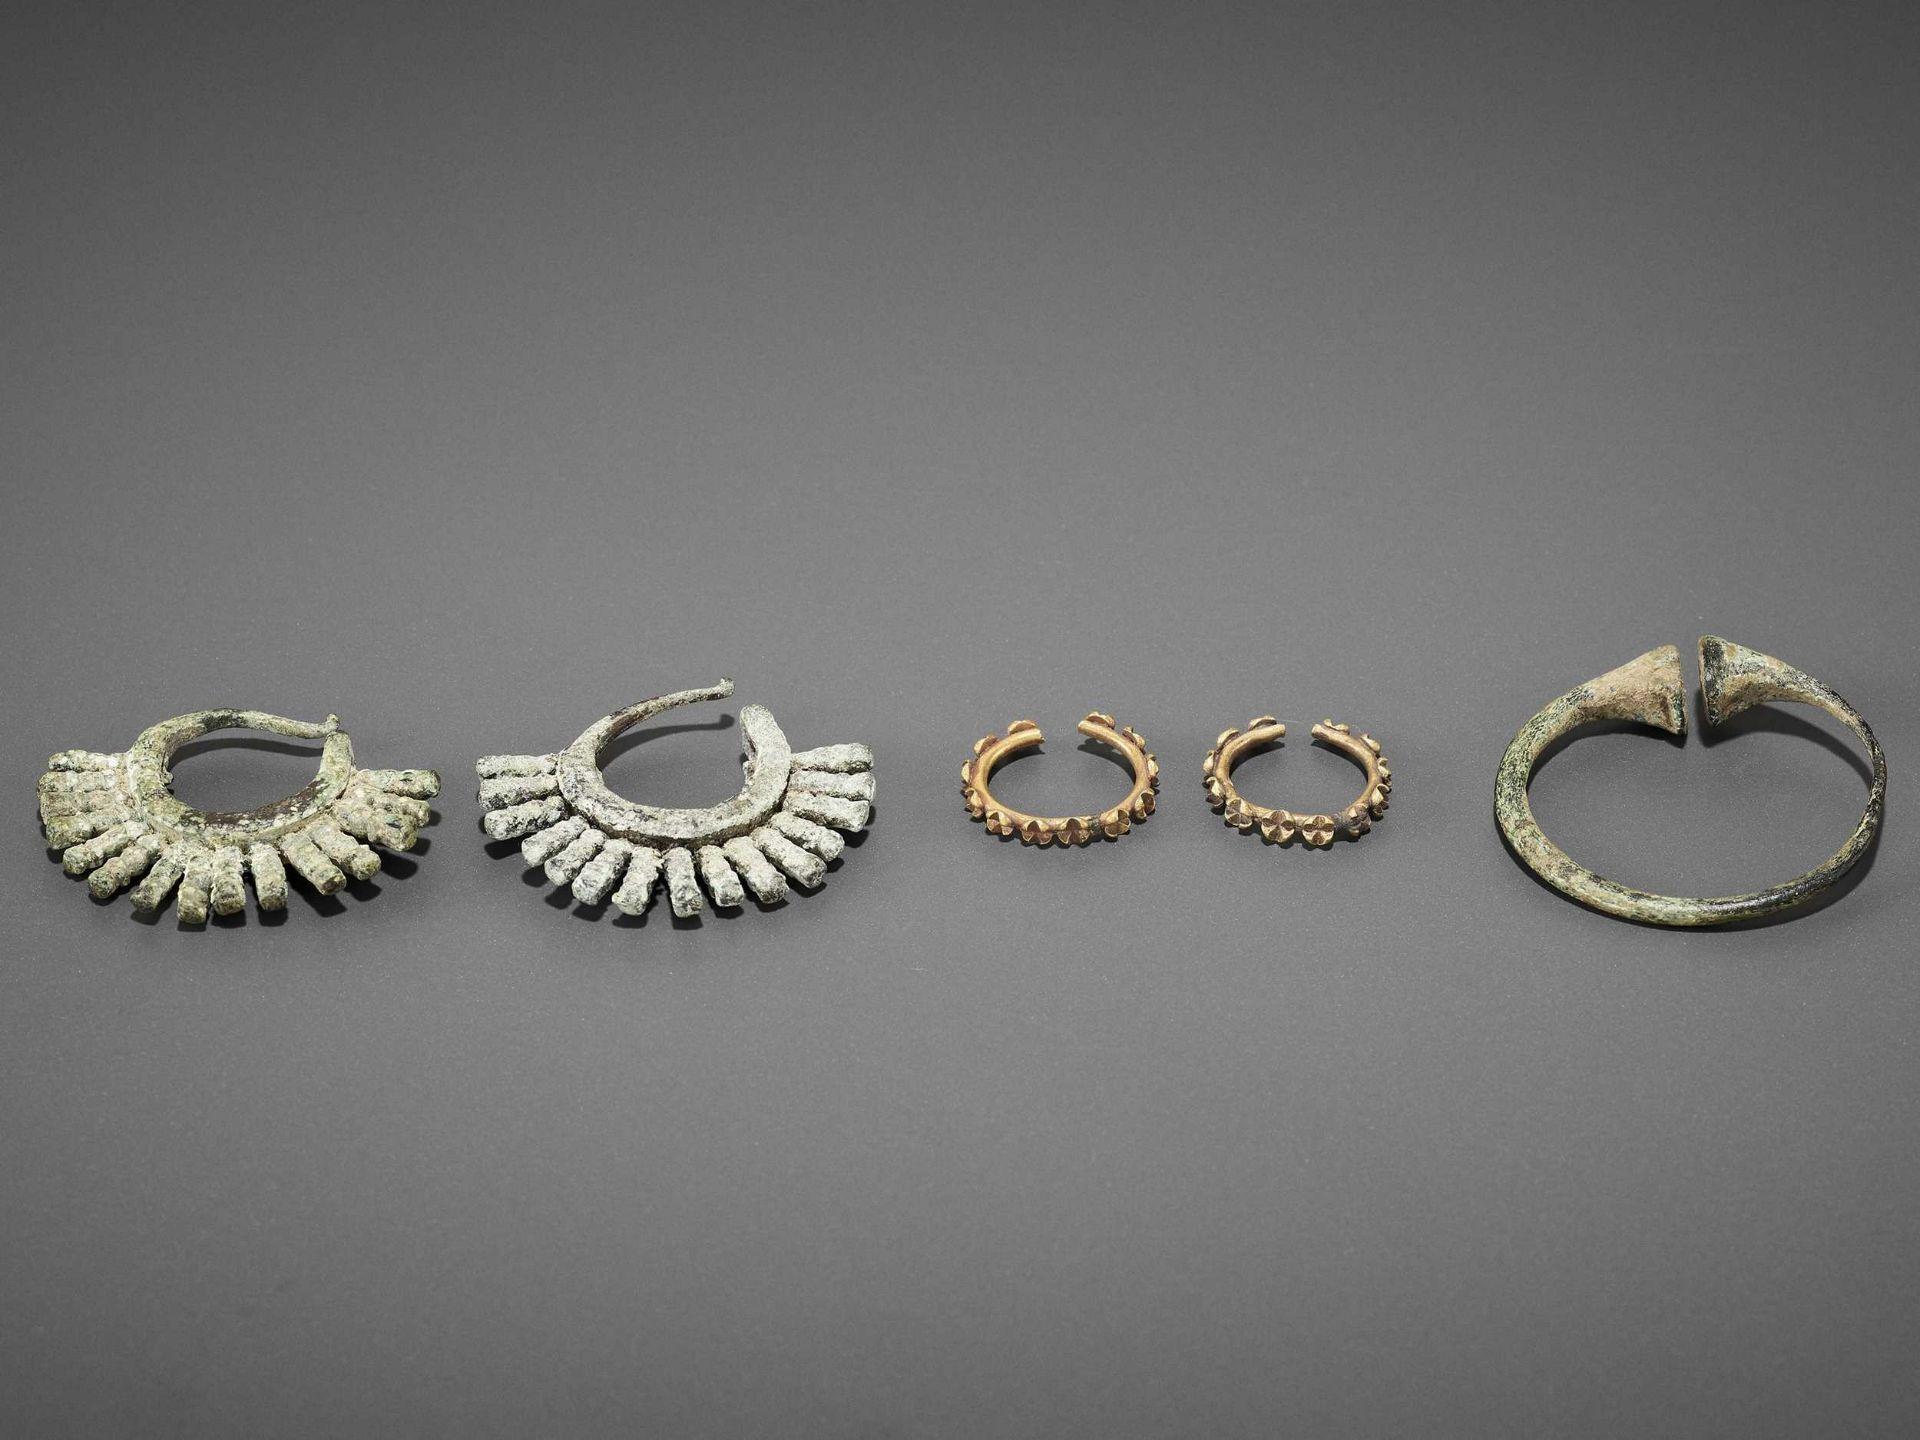 FIVE BACTRIAN GOLD AND BRONZE EARRINGS - Bild 2 aus 6